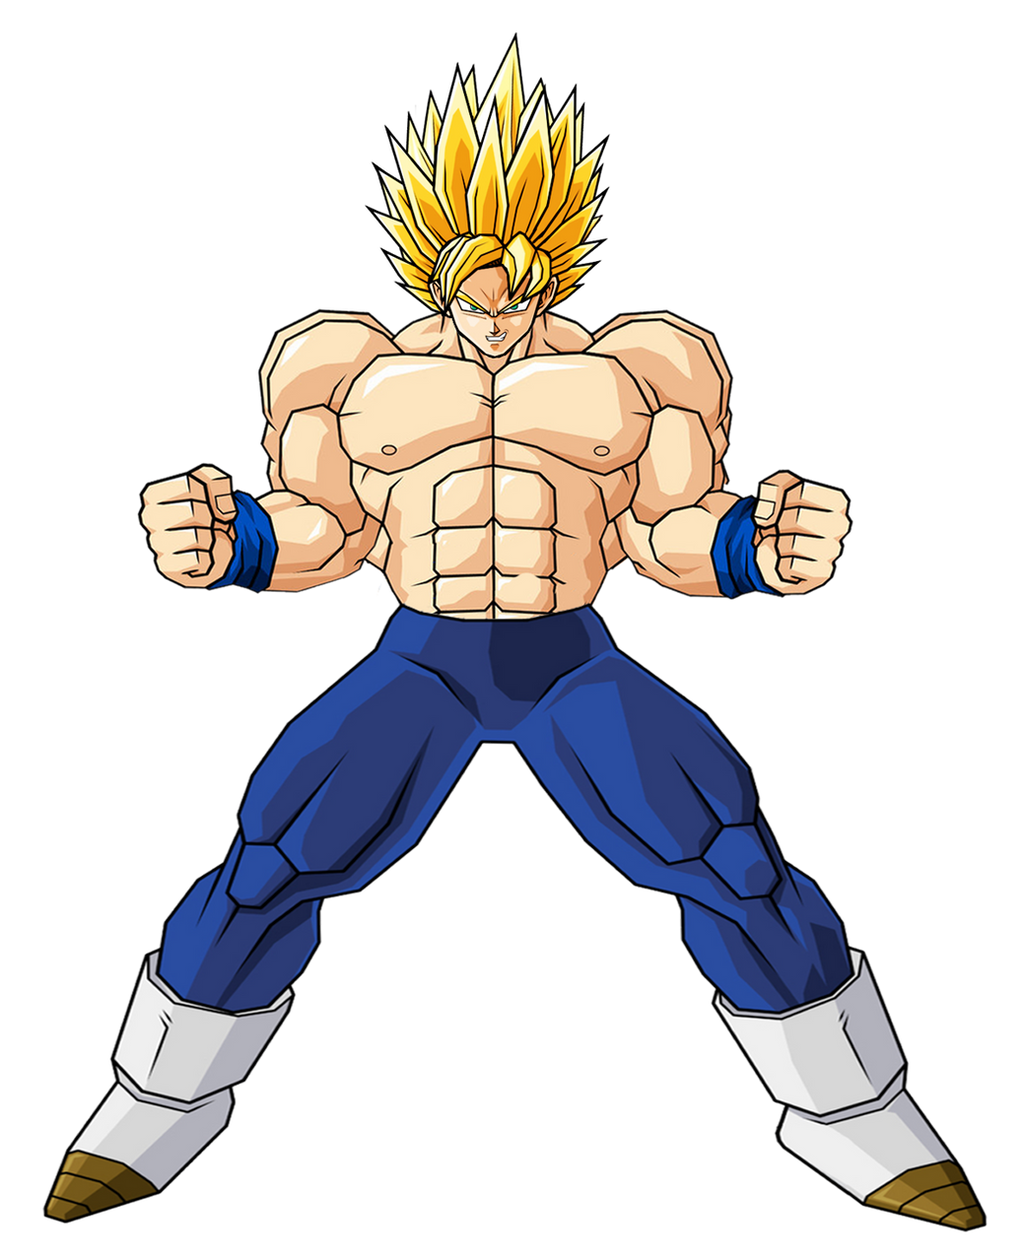 Goku Ultra Super Saiyan 2 by GokuGarlic